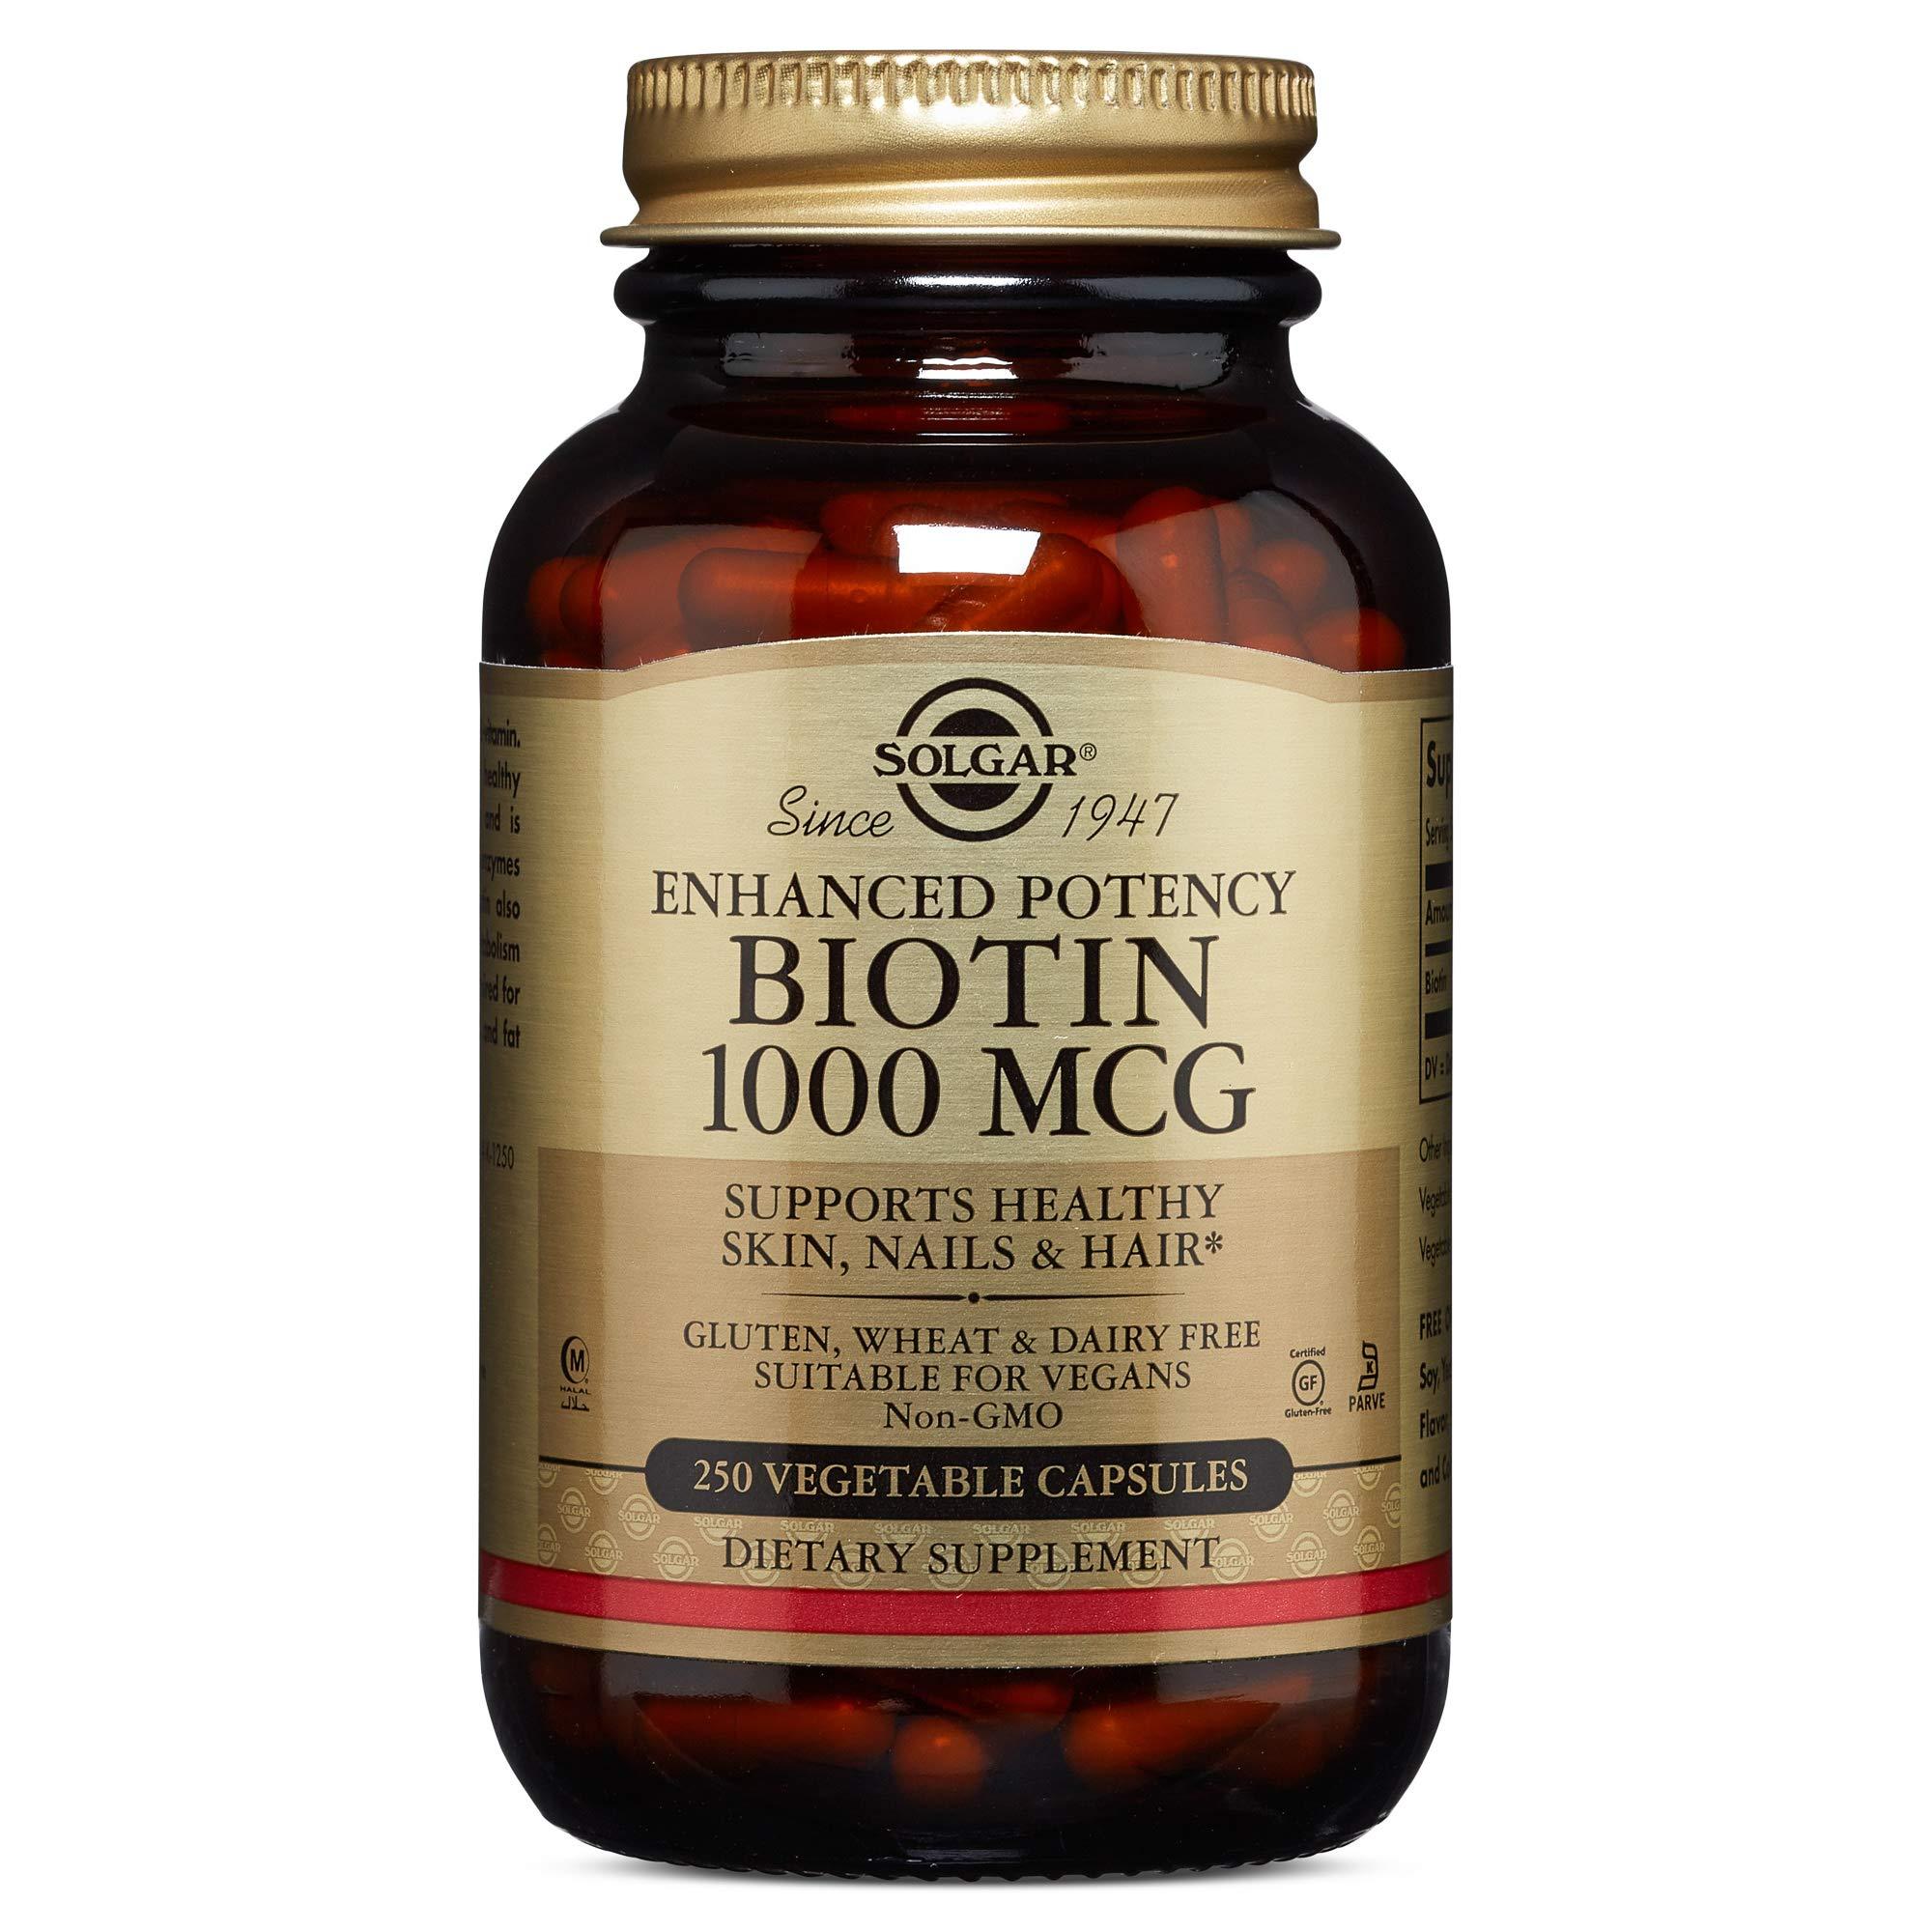 Solgar - Biotin 1,000 mcg, 250 Vegetable Capsules